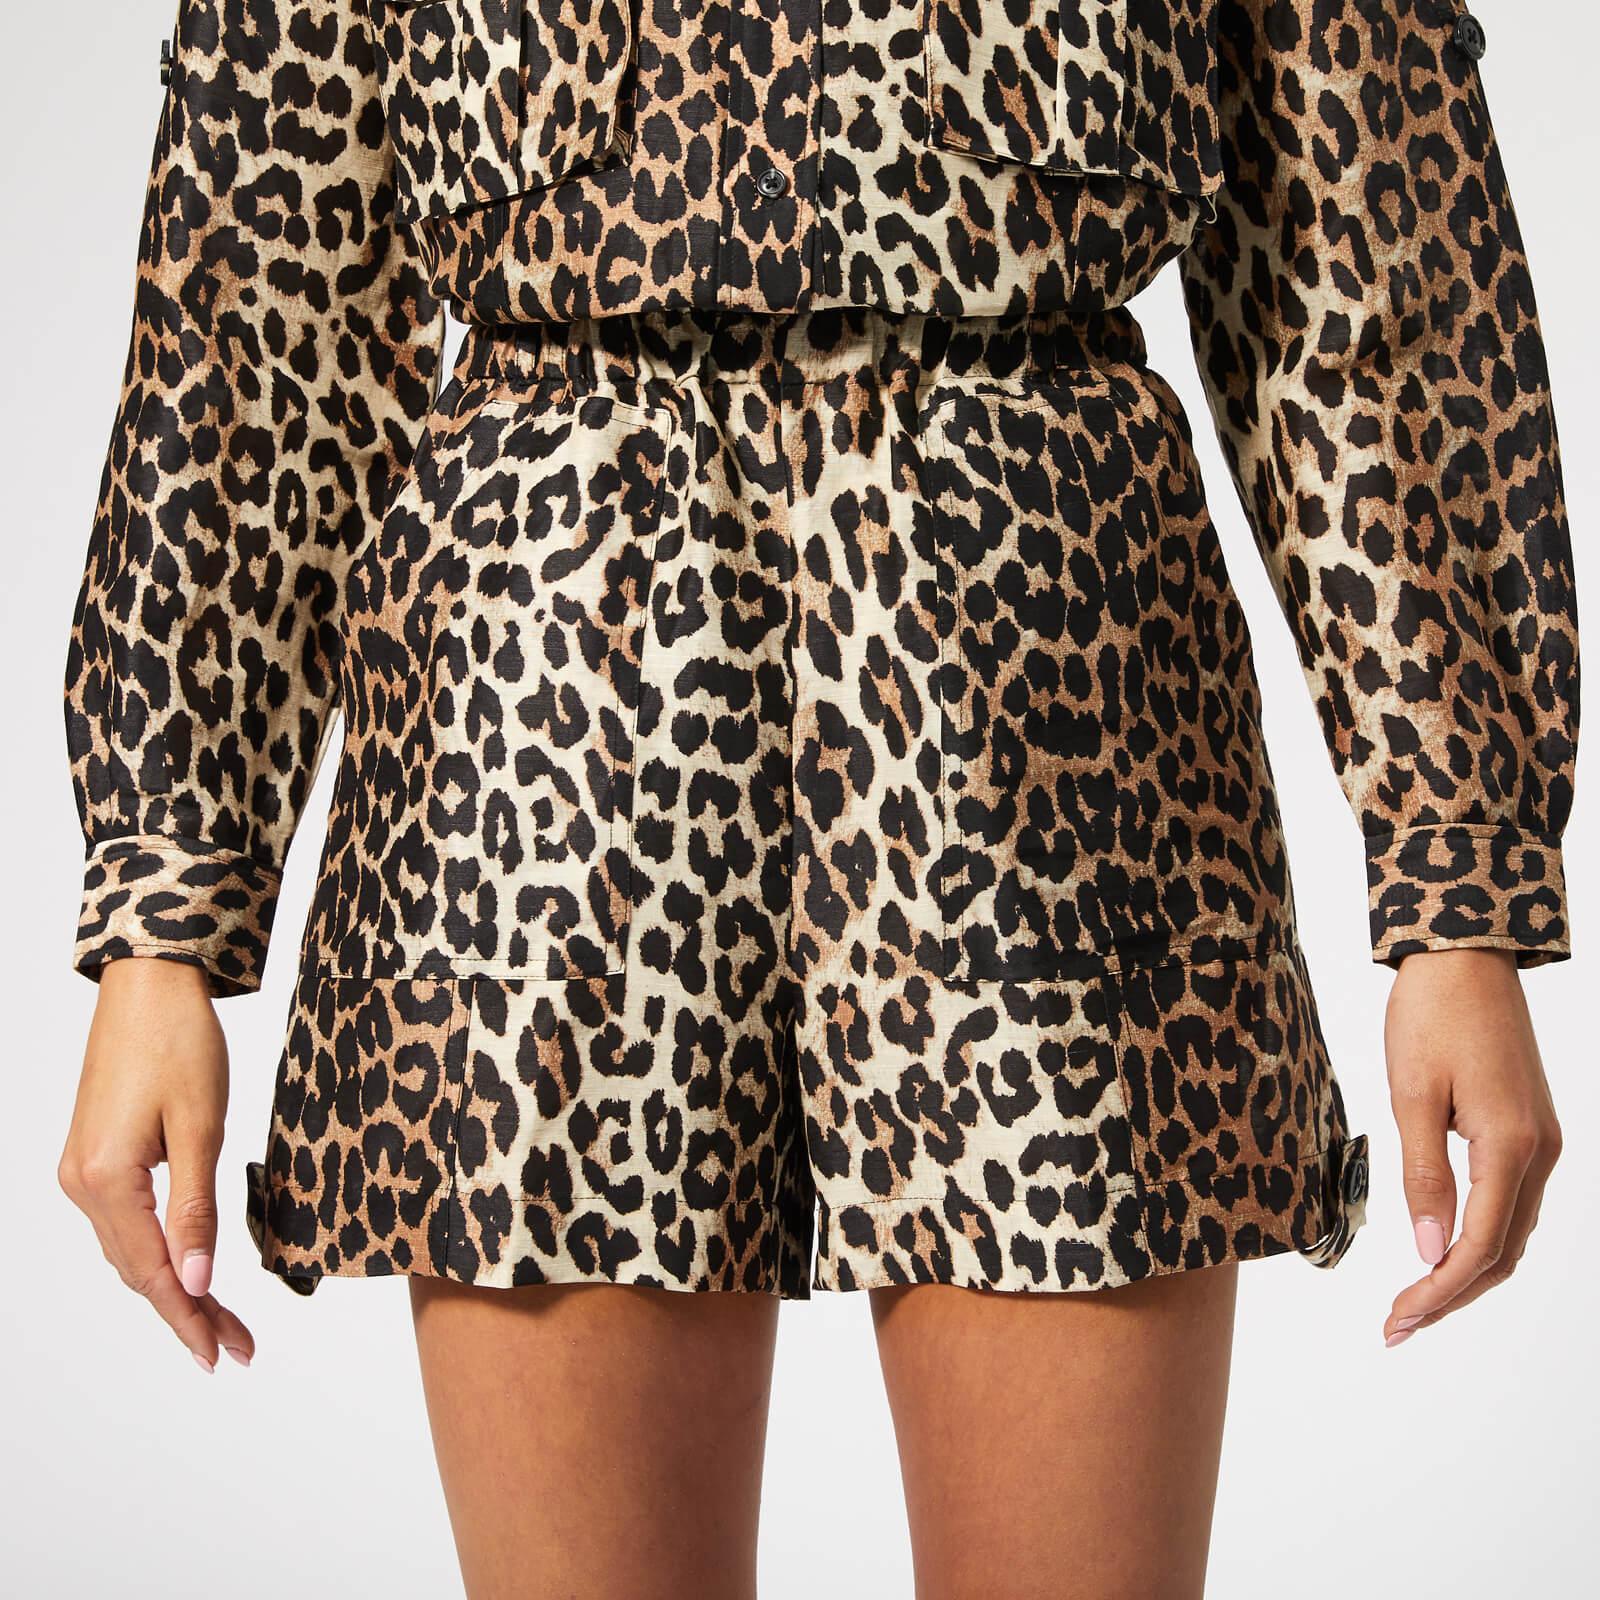 f098254df634 Ganni Women's Cedar Shorts - Leopard - Free UK Delivery over £50